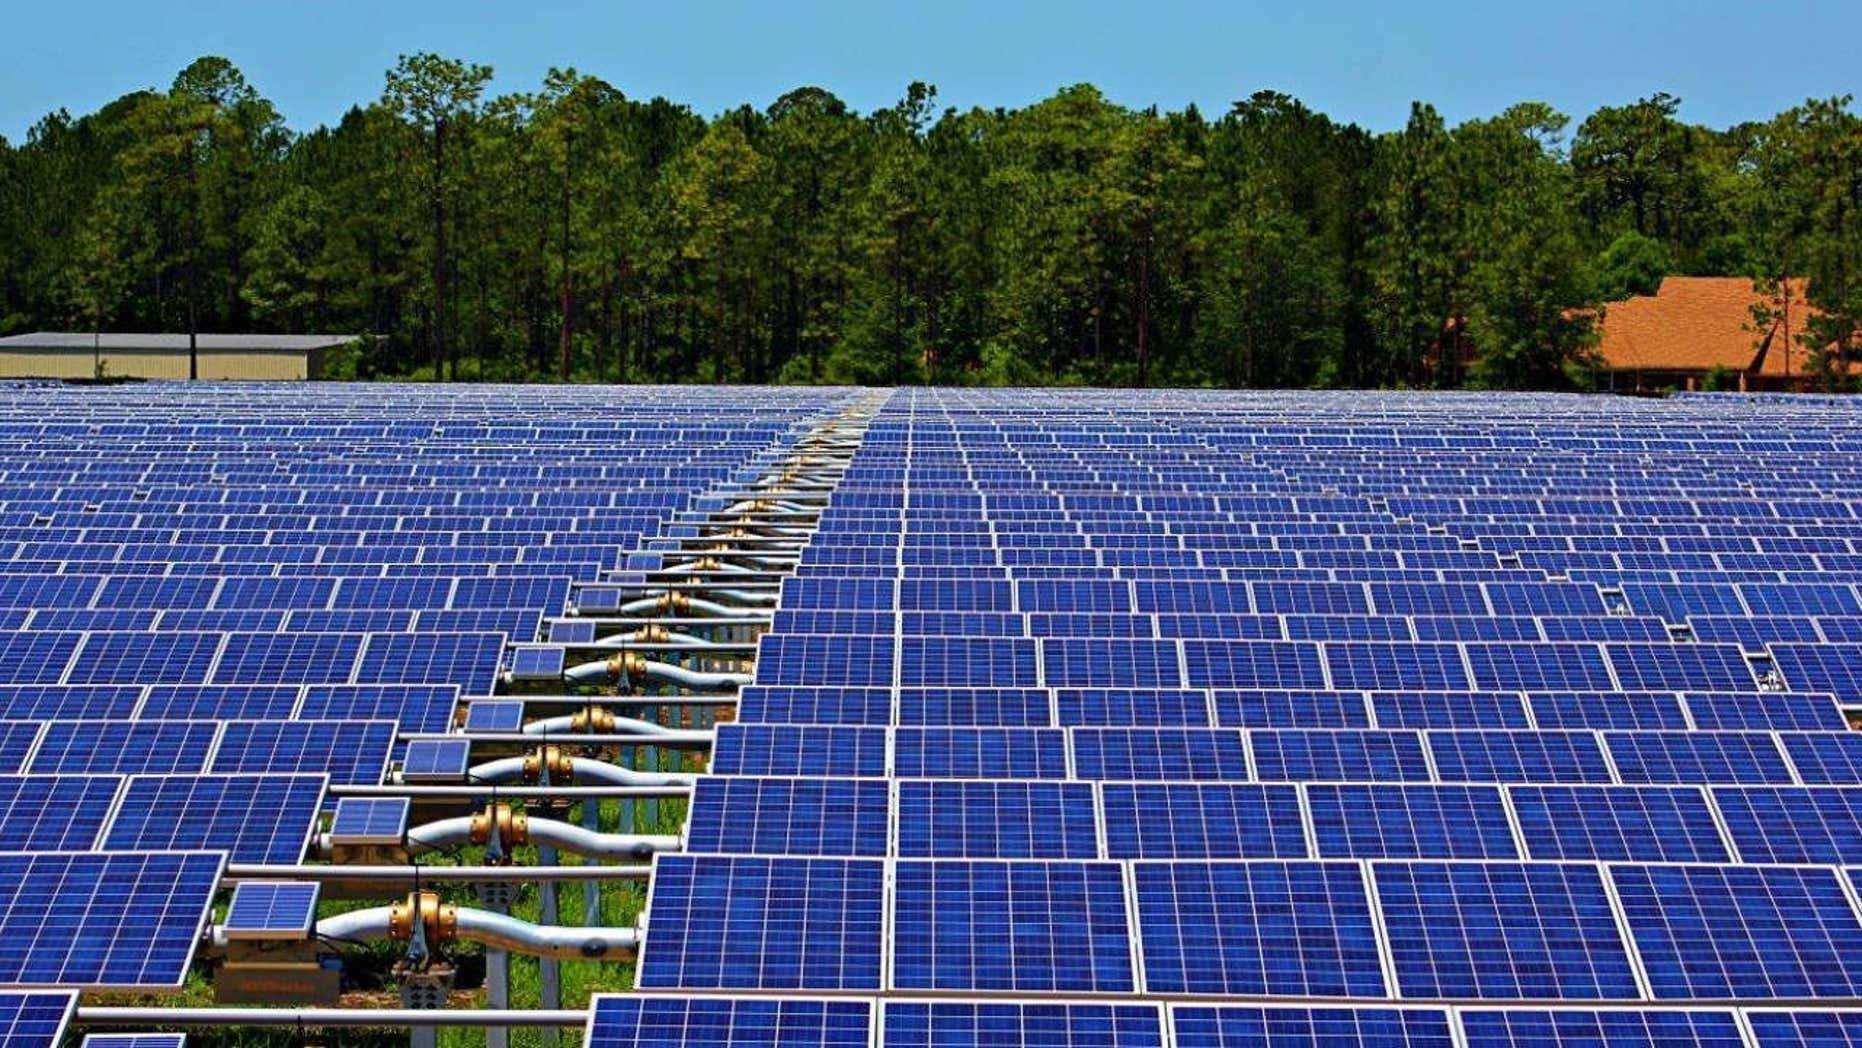 Report: Trump suggests solar panels for border | Fox News